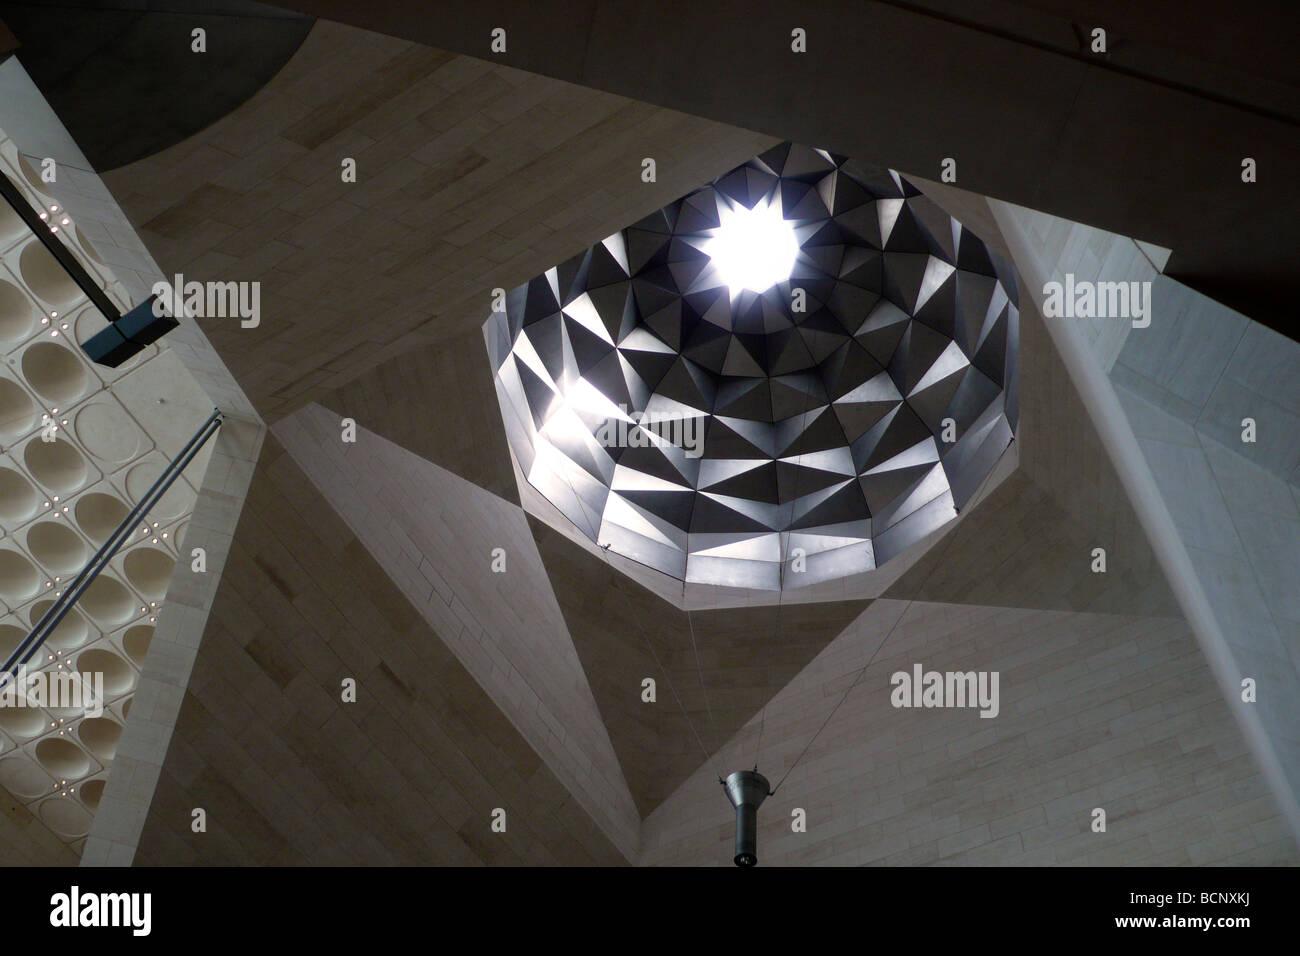 Qatar musée d'art islamique de Doha Photo Stock